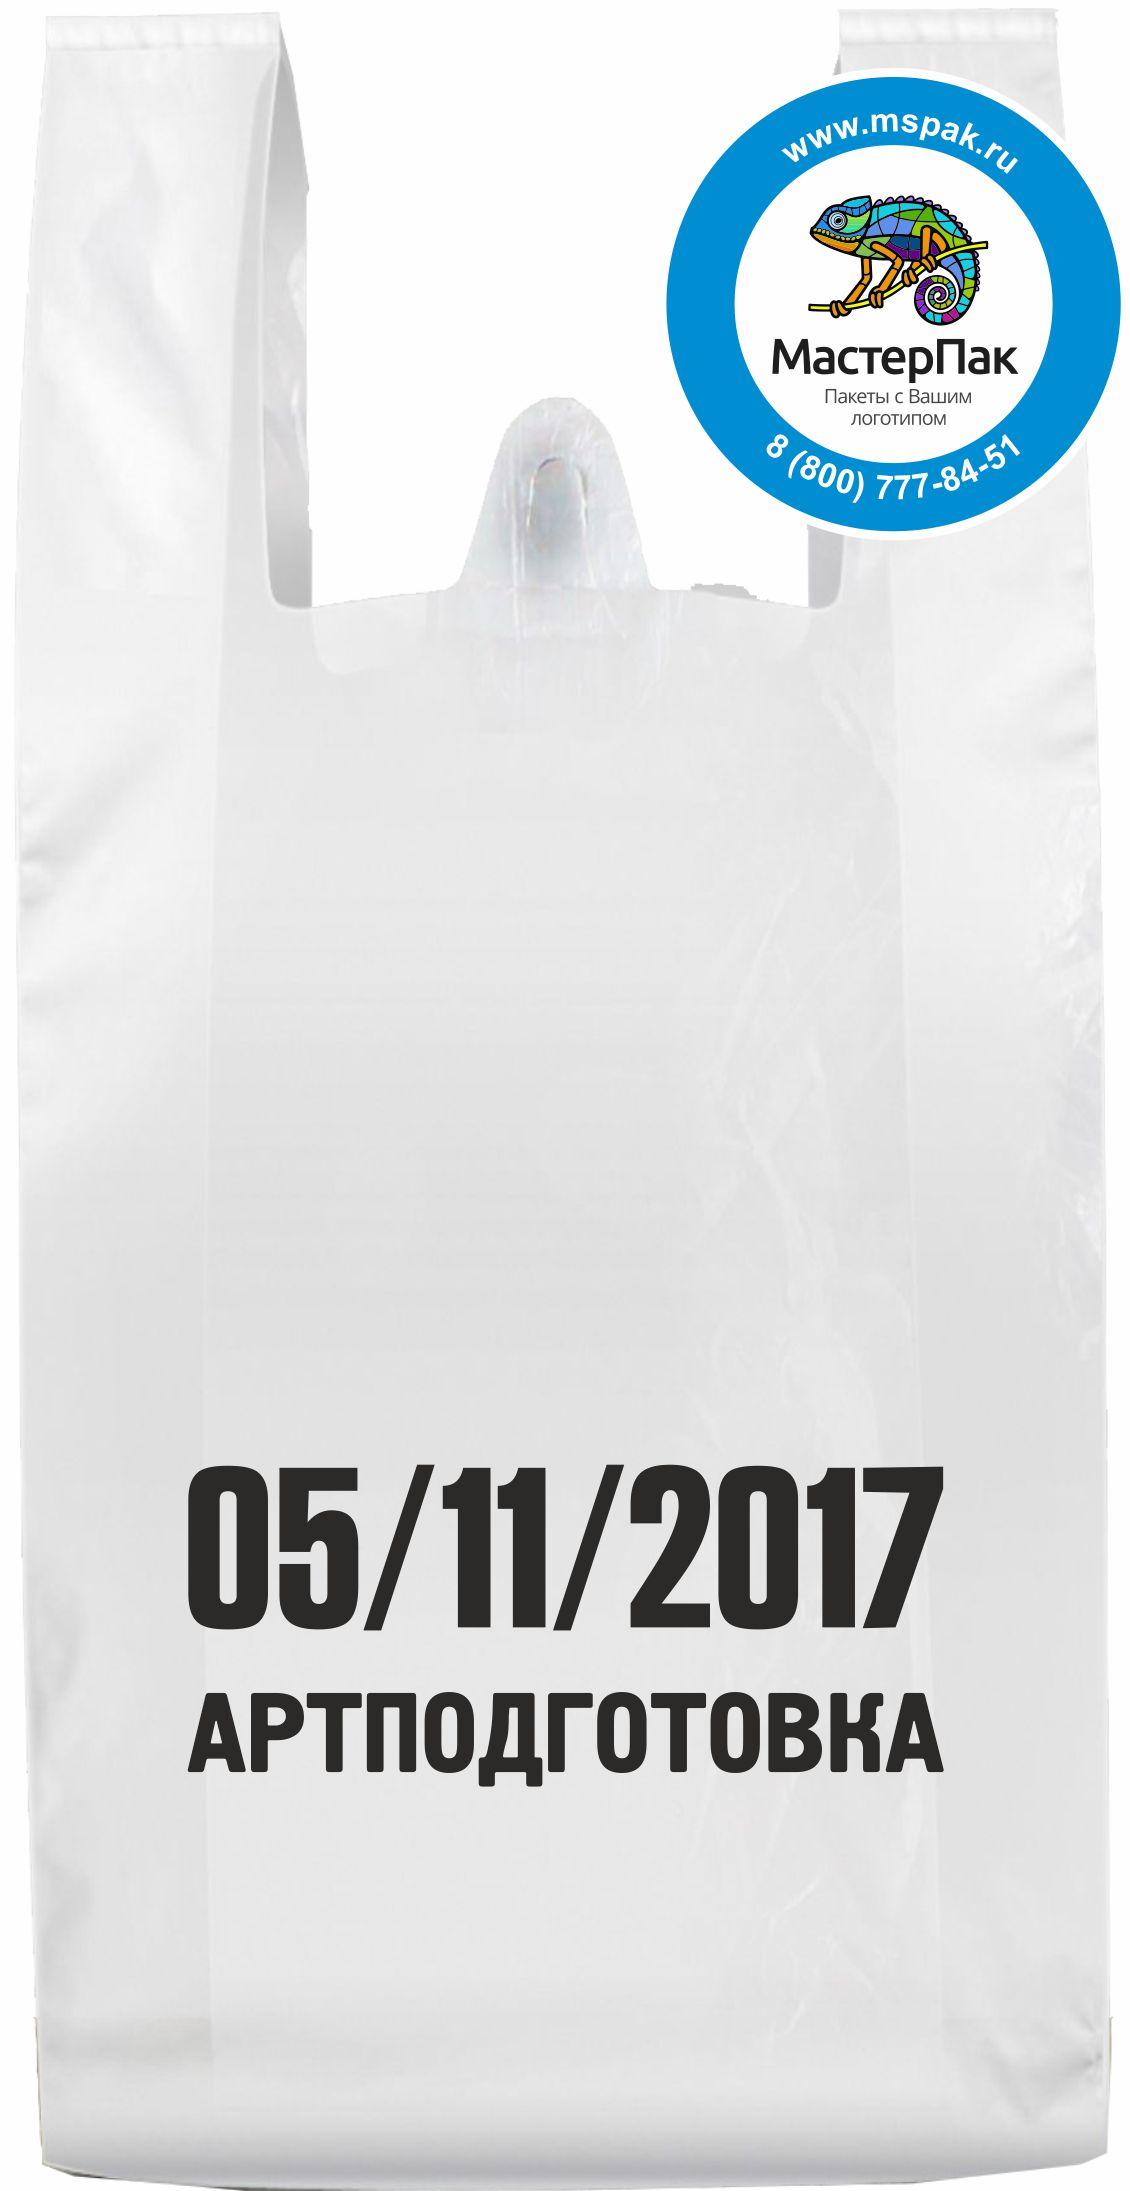 Пакет-майка ПНД белый с логотипом Артподготовка